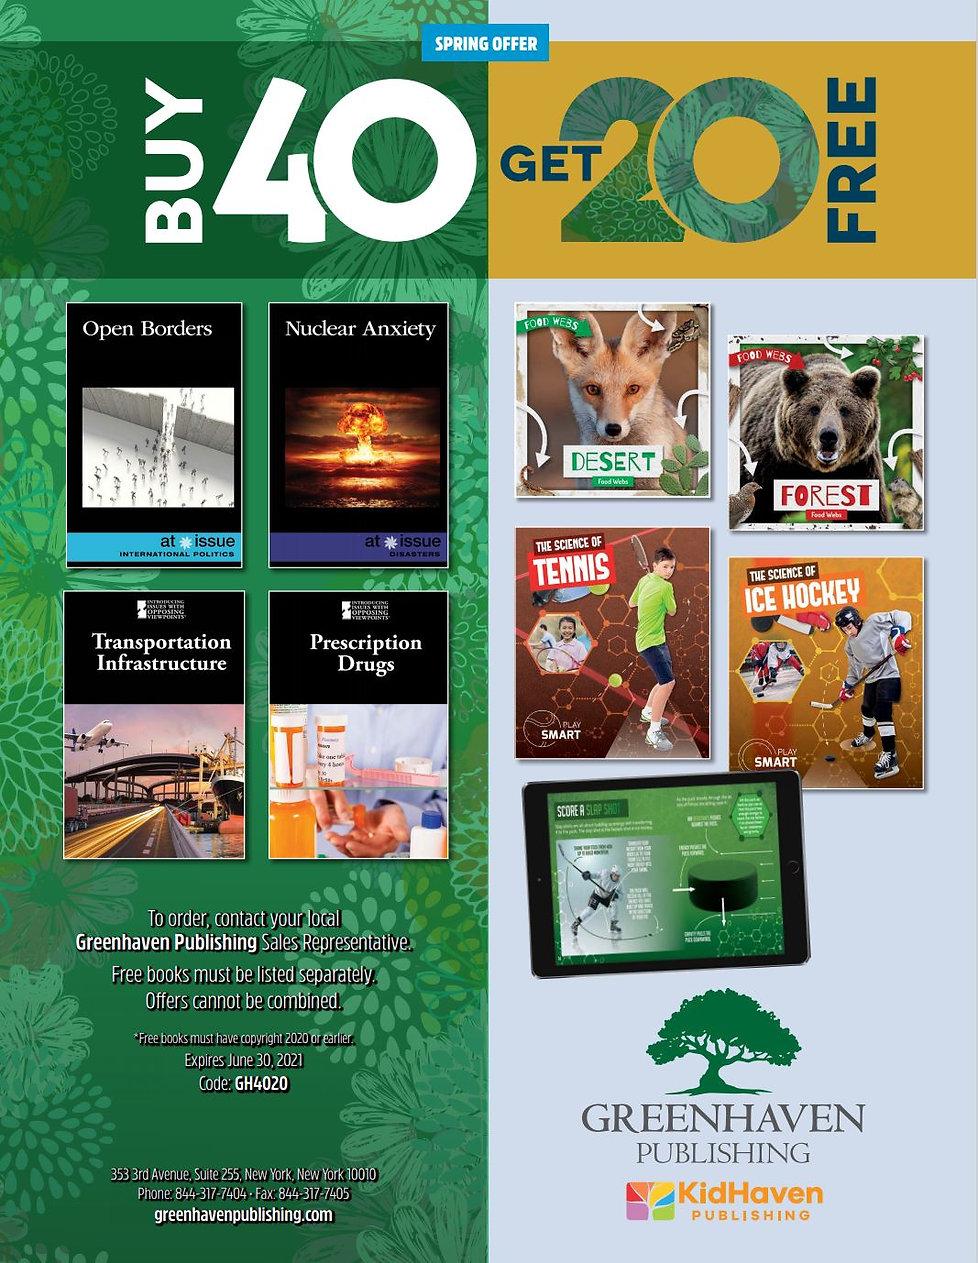 Greenhaven Buy 40 Get 20 Spring 2021.JPG